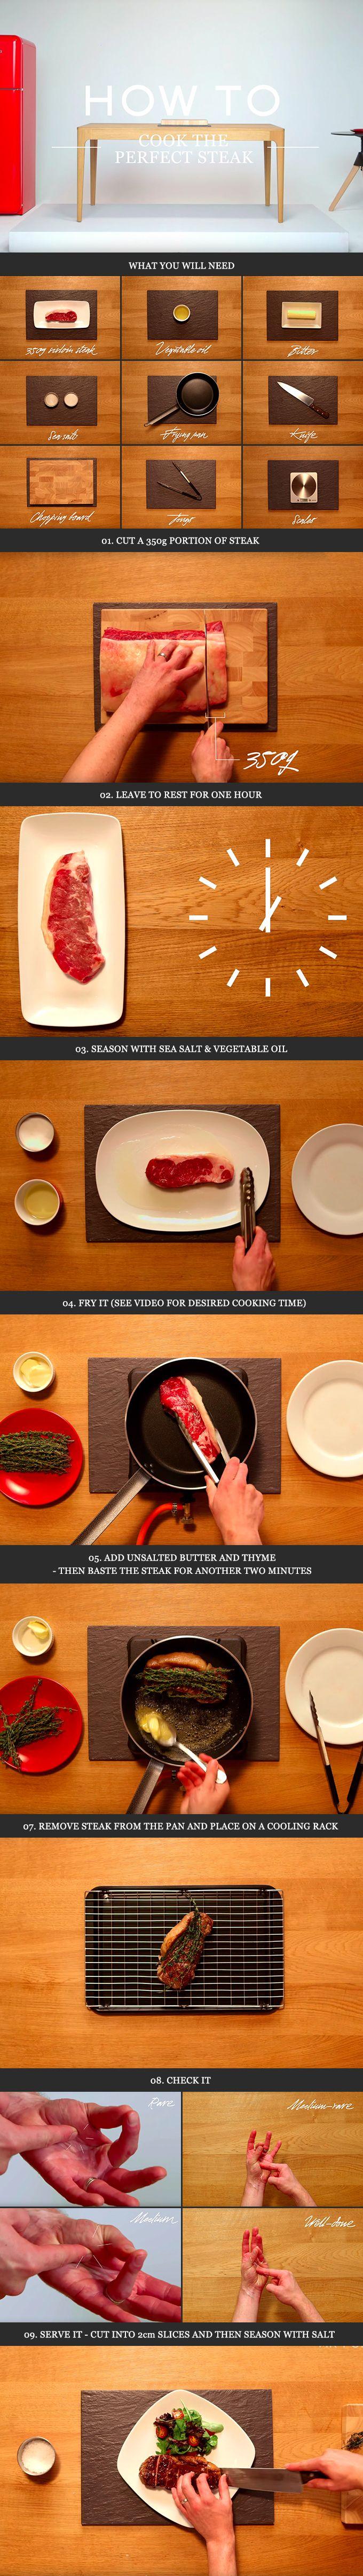 HOW TO COOK A STEAK Step 1: Cut it Step 2: Season it Step 3: Fry it Step 4: Check it Step 5: Serve it. #MRPORTEReats